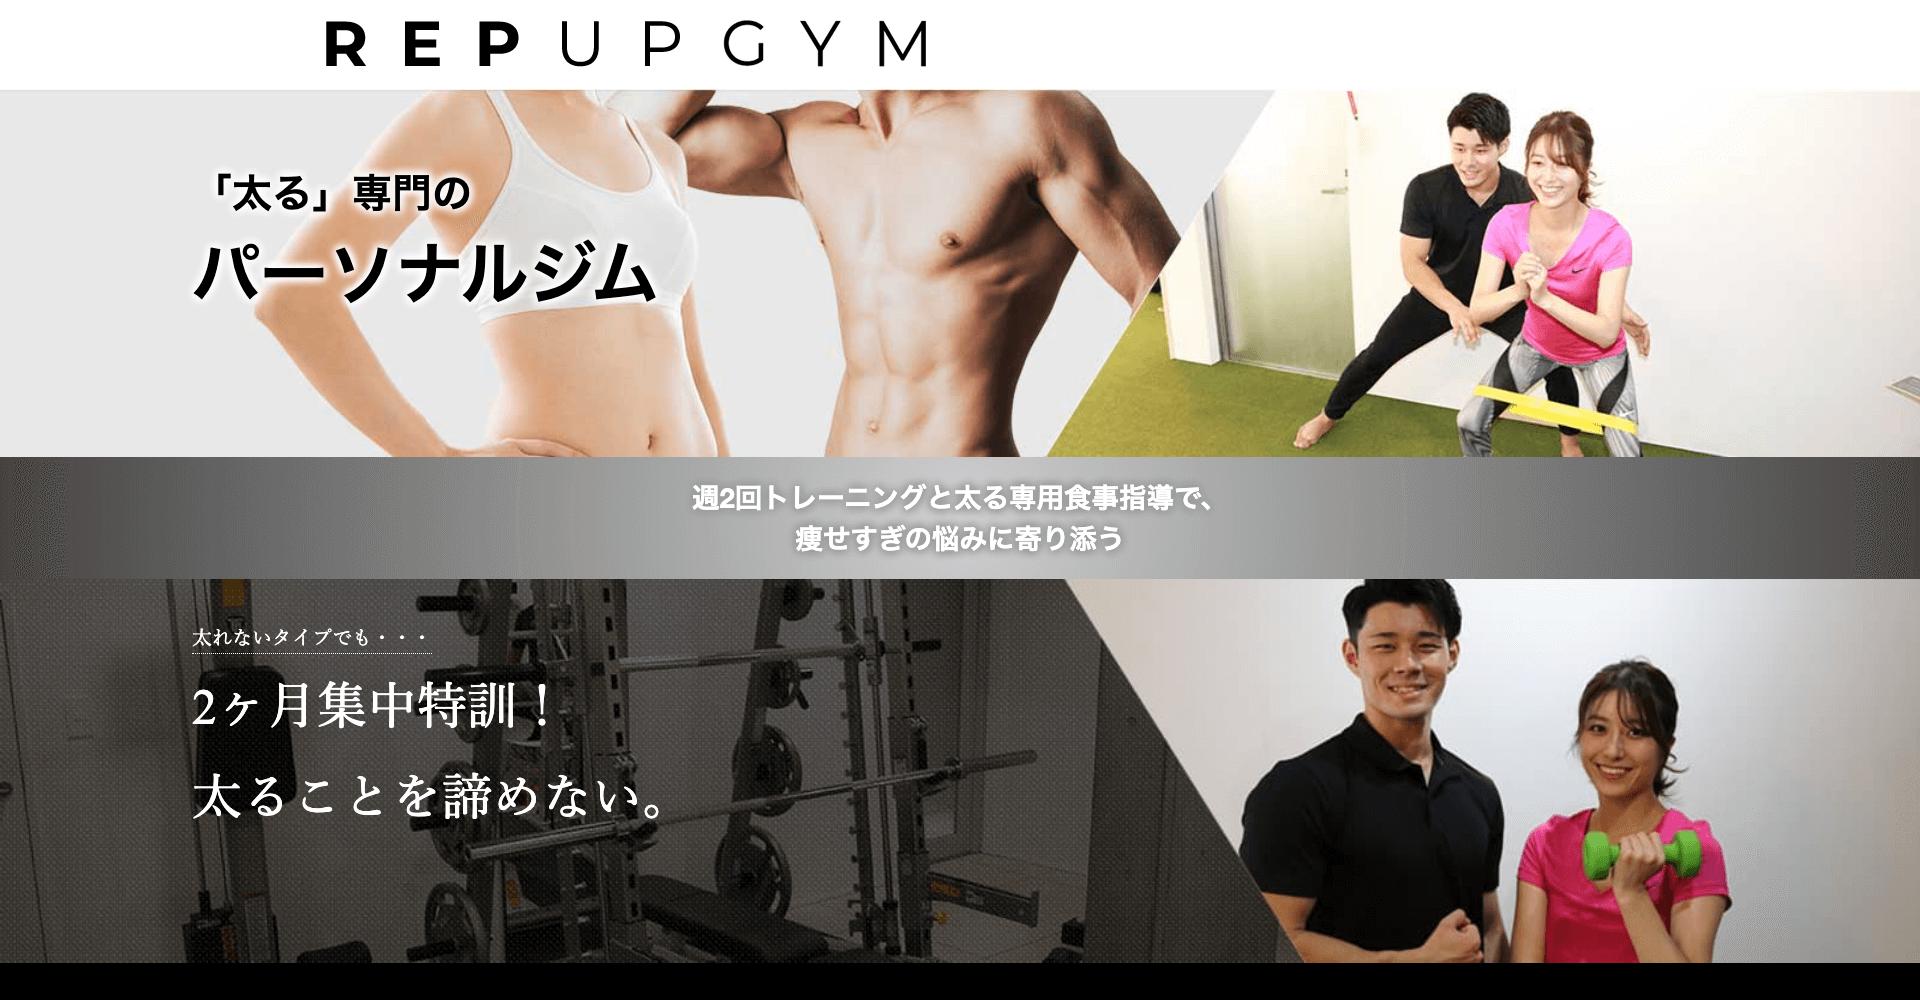 REPUPGYM(レップアップジム)恵比寿店